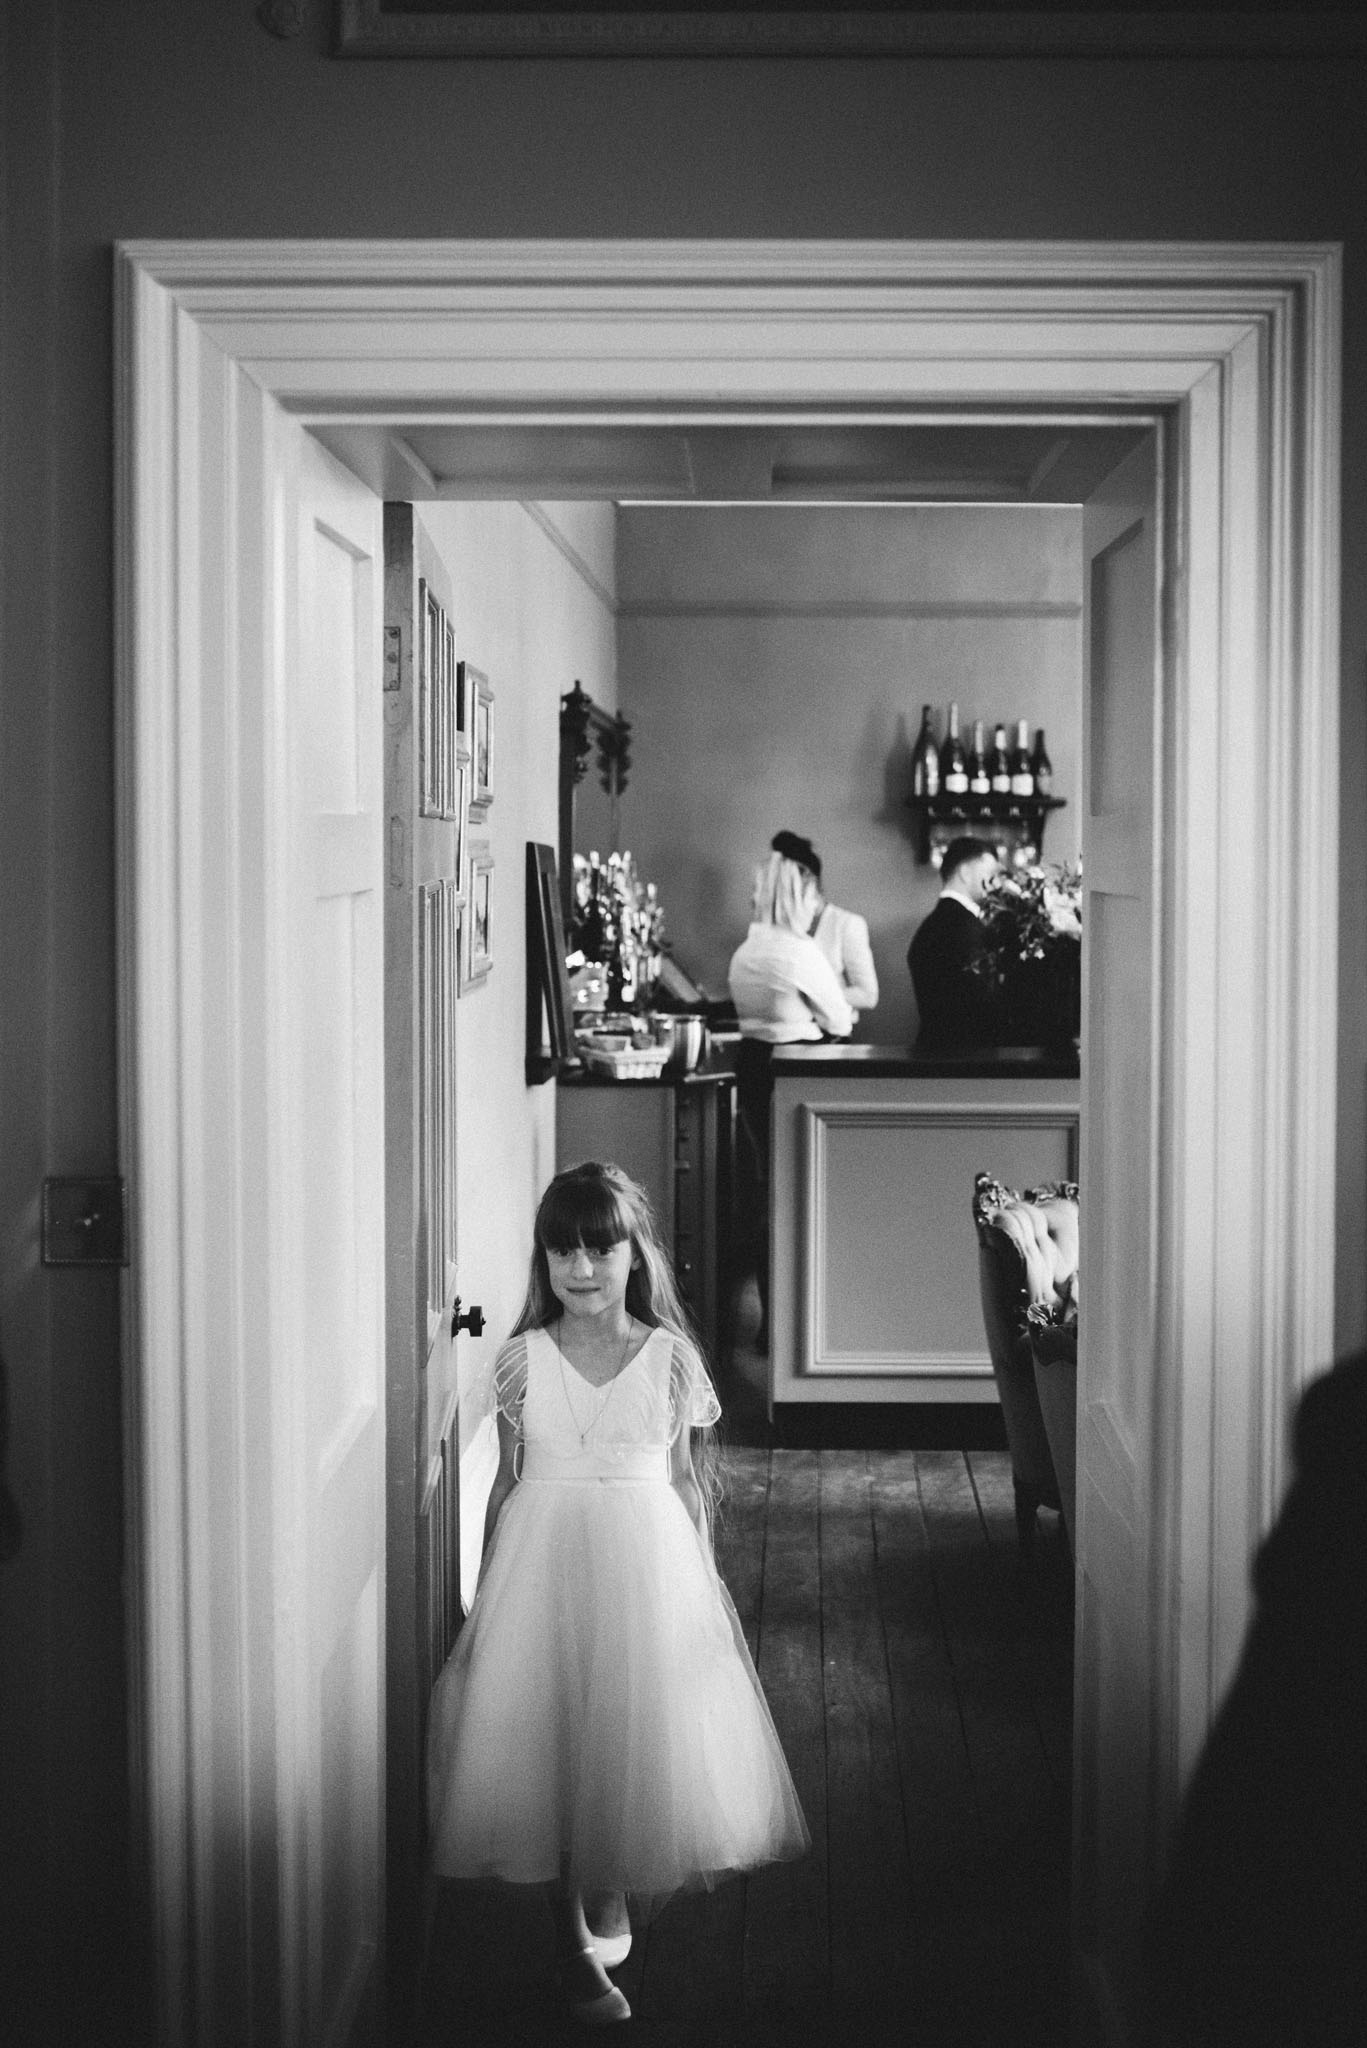 wedding-photographer-glewstone-court-hereford-scott-stockwell-photography325.jpg